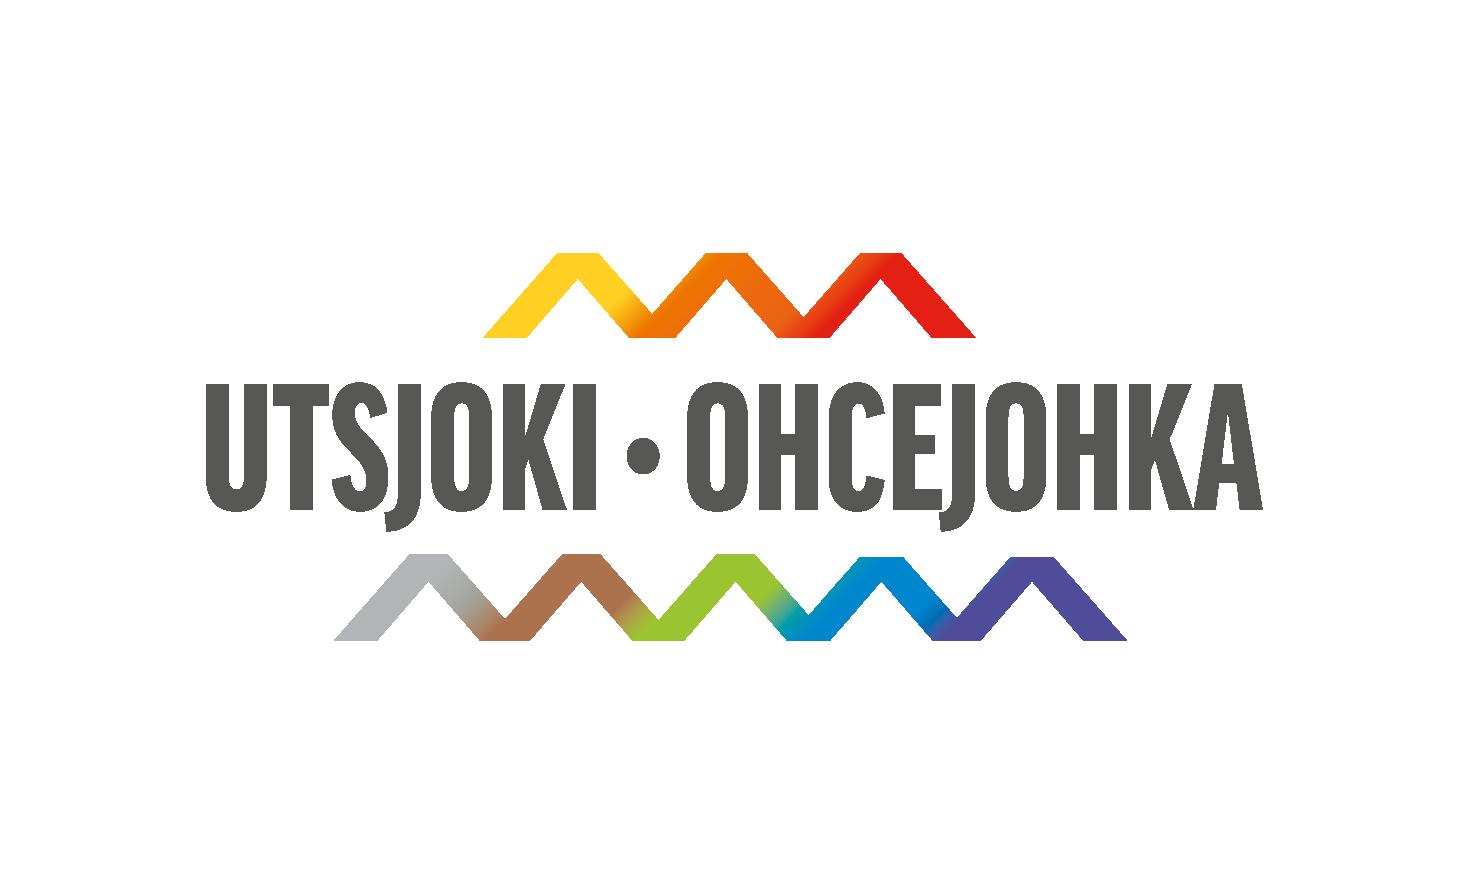 utsjoki logo